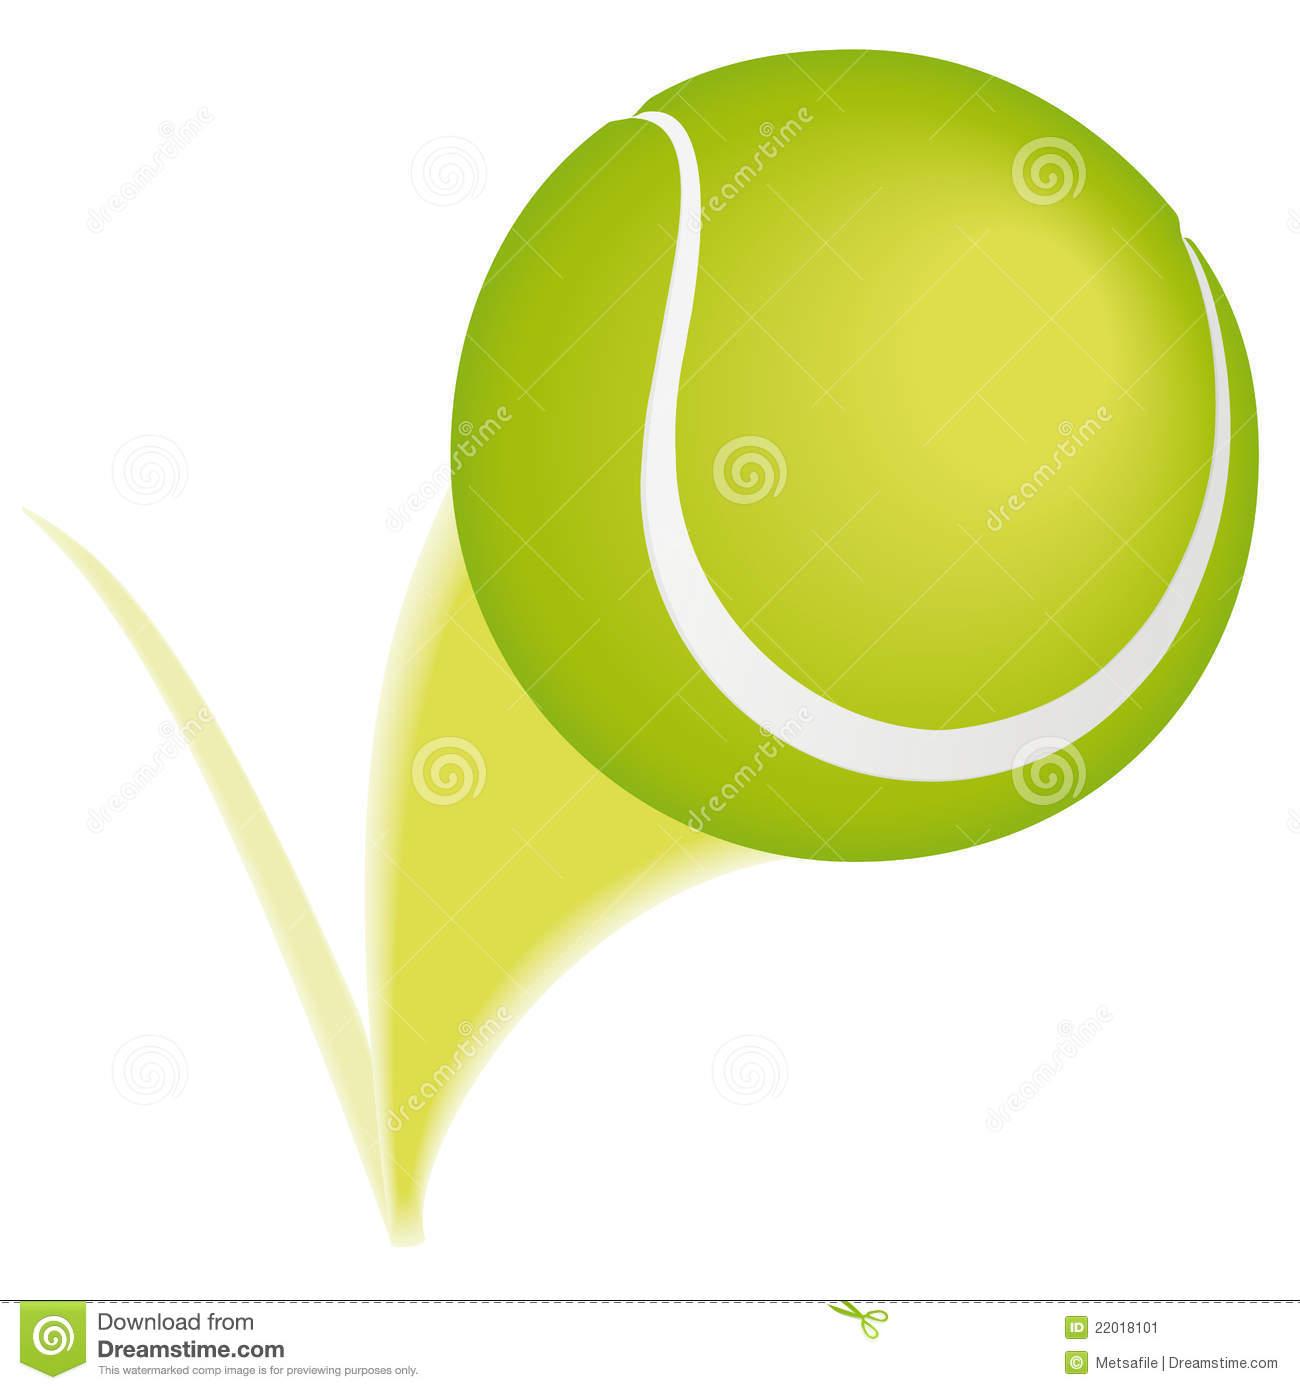 Ball clipart tennis ball. Bouncing panda free images